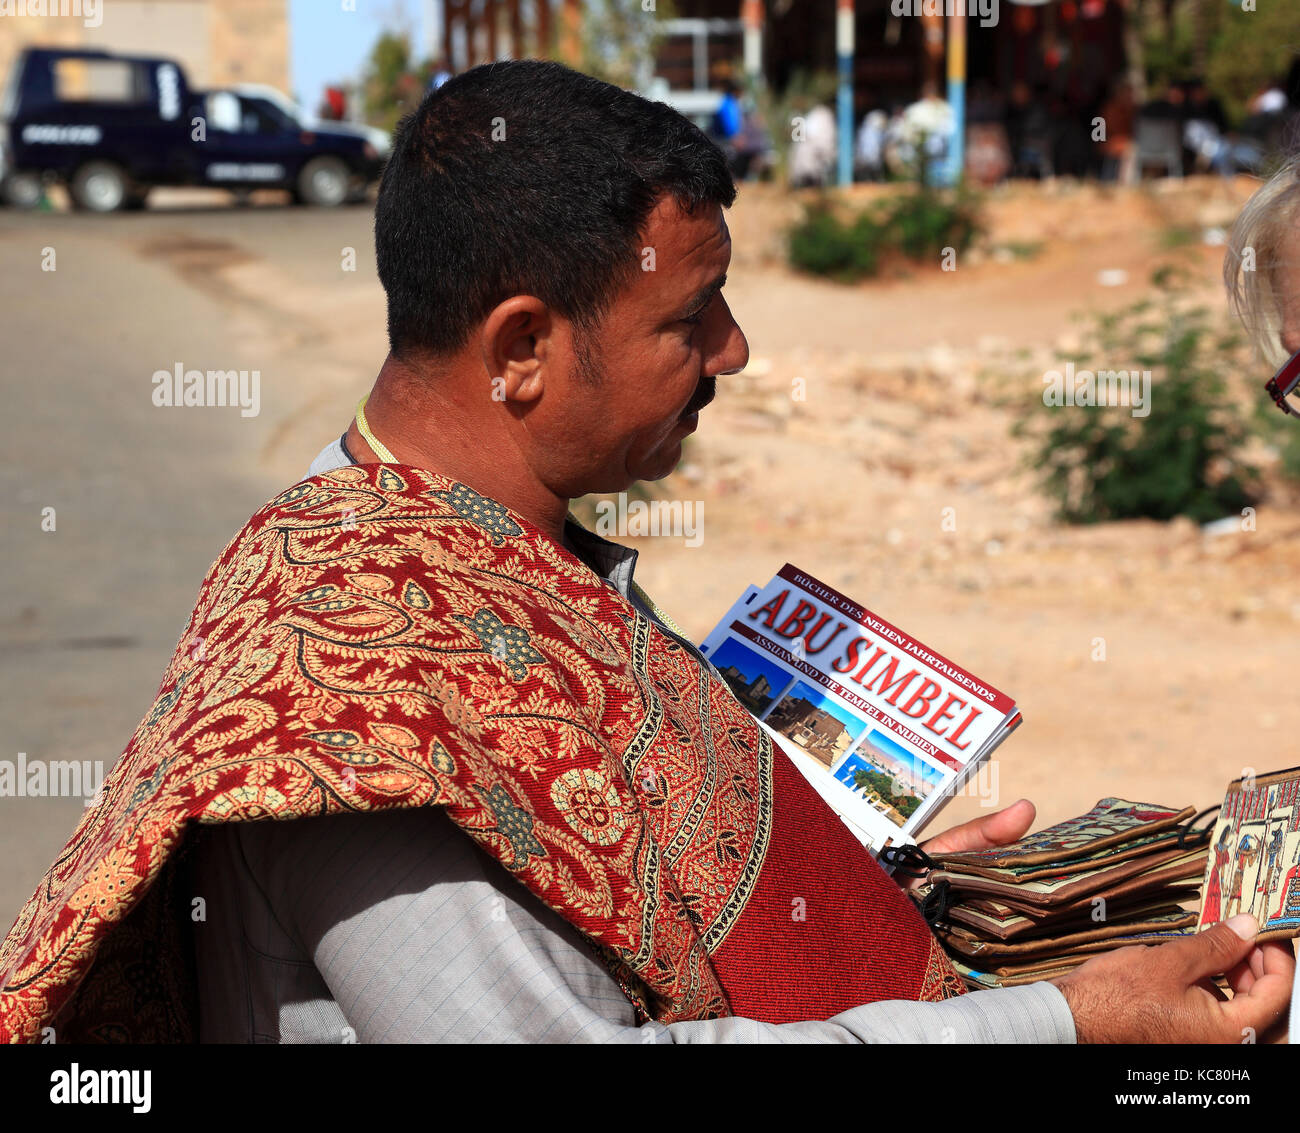 Junge Afrikaner sind Souvenirs im Tempel von Abu Simbel, Abu simbal, Oberägypten Stockbild